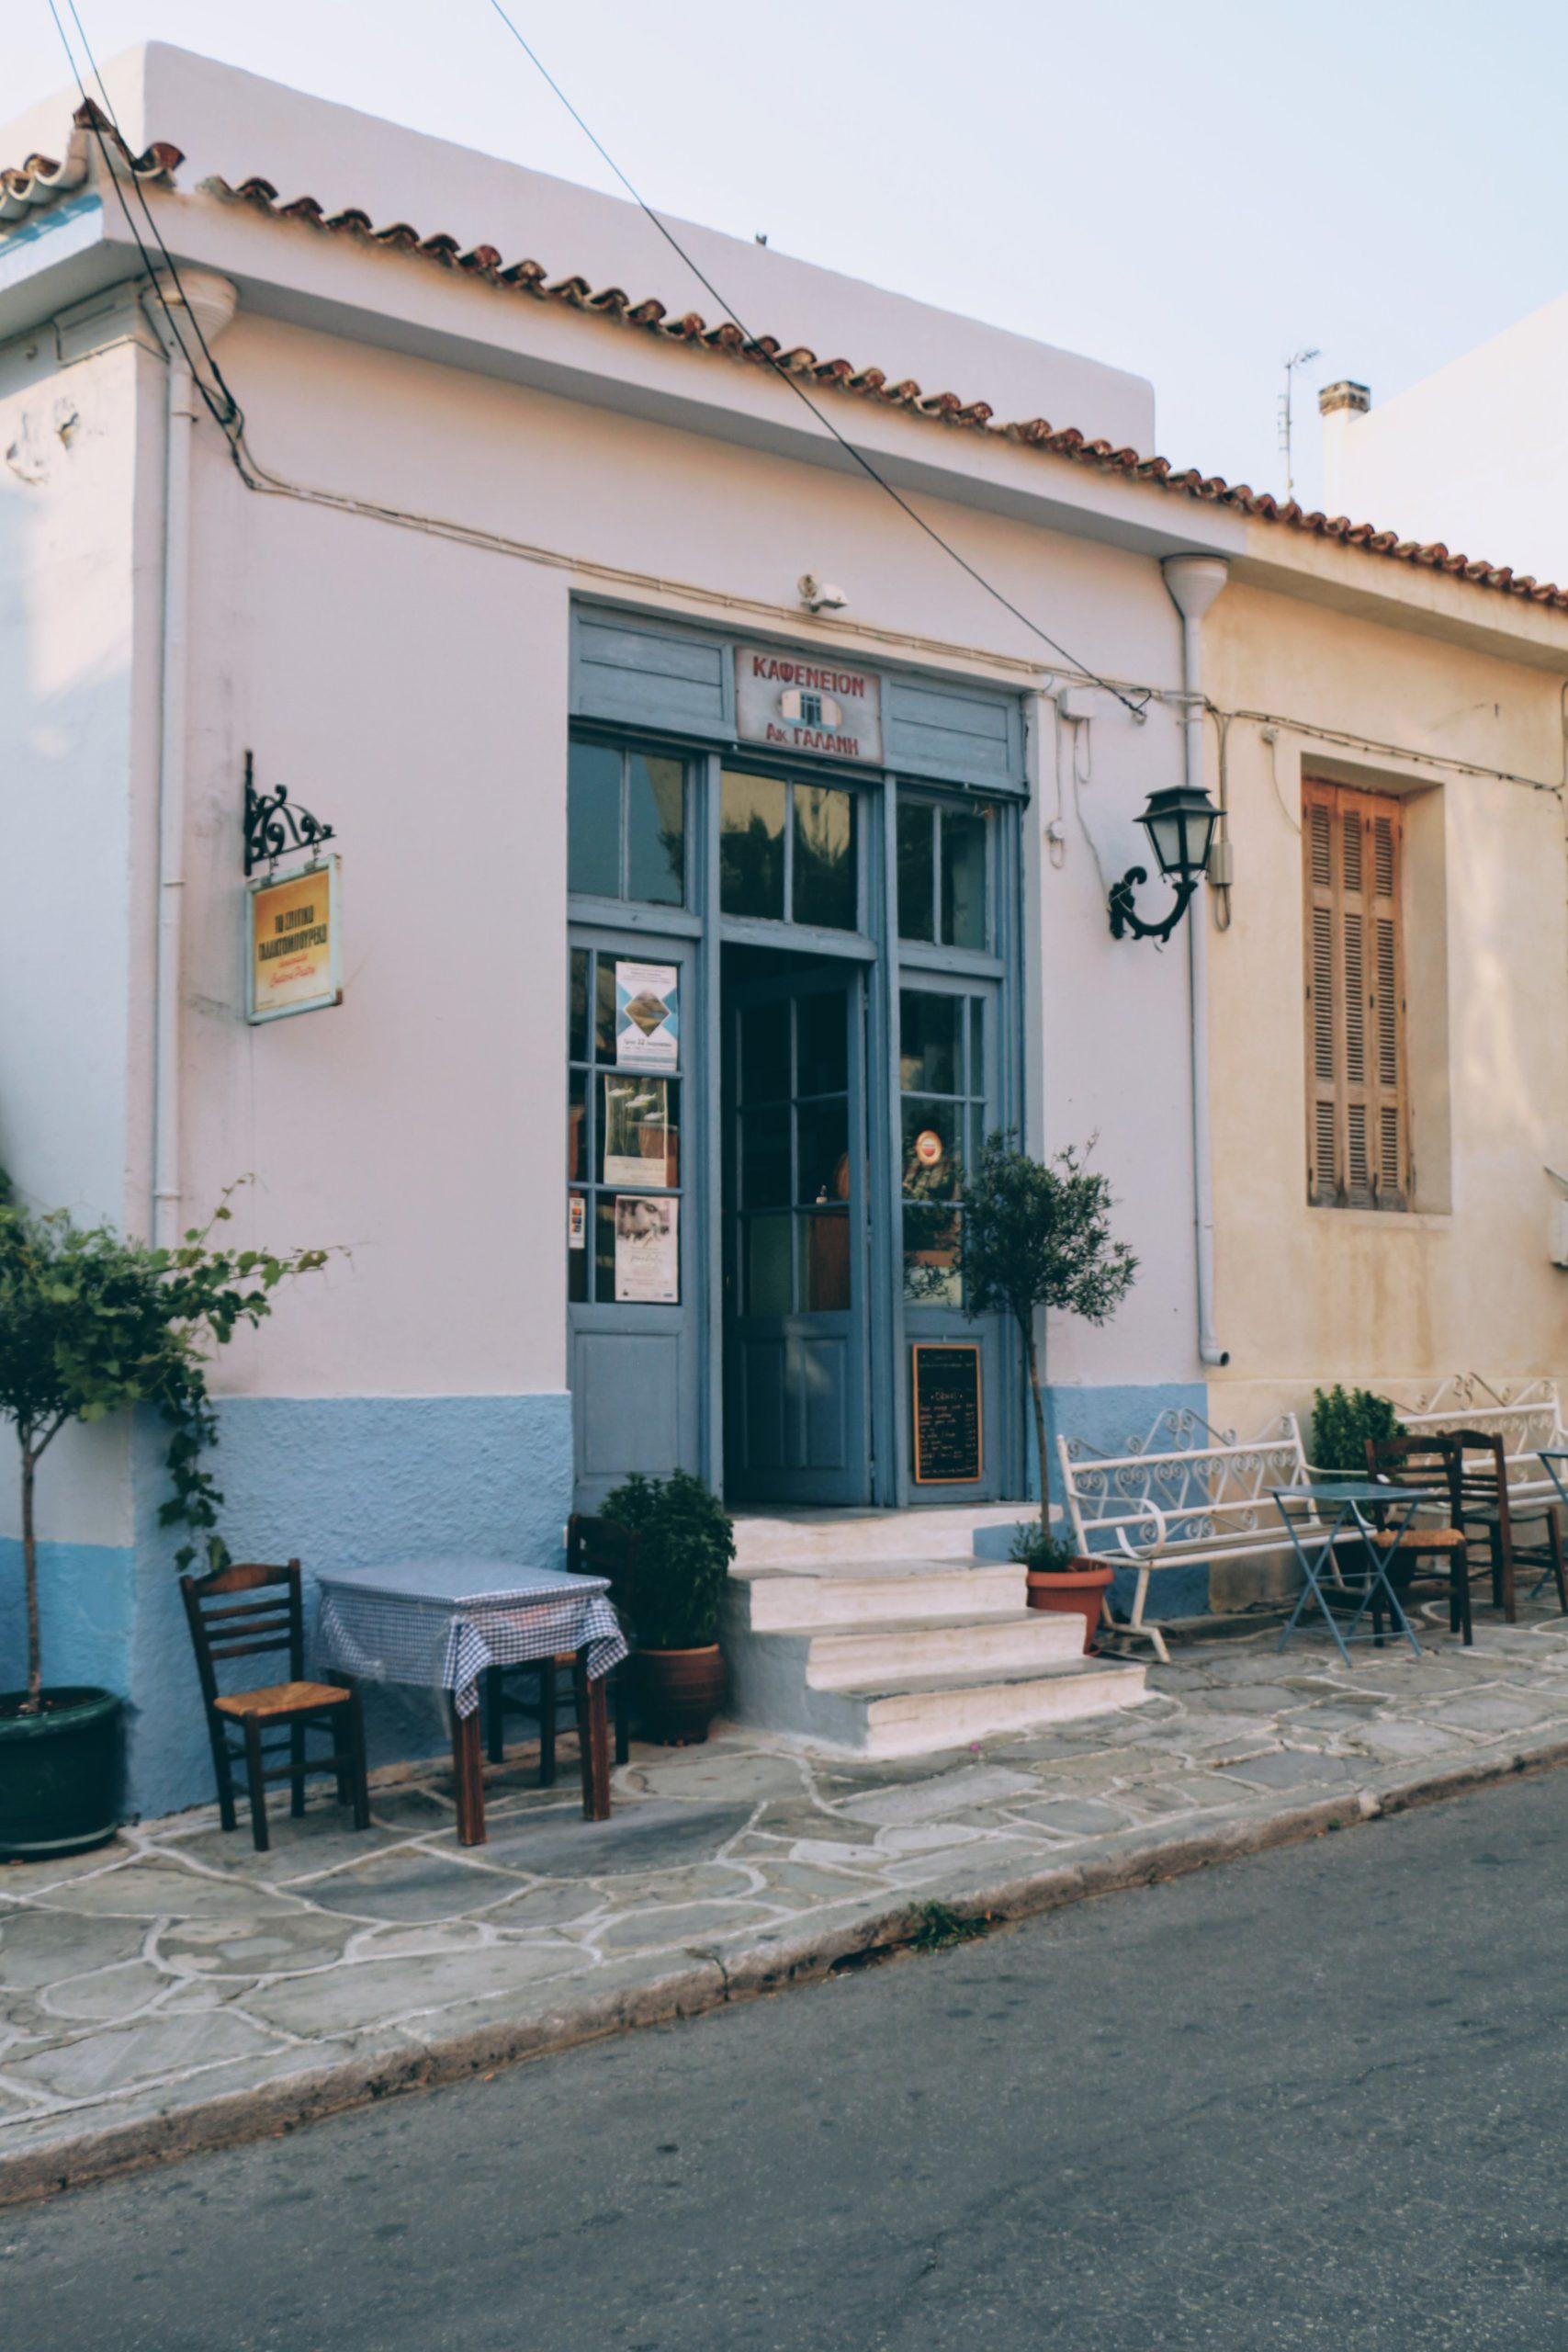 Naxos: To Spitiko Galaktoboureko, where locals hang in Chalkion